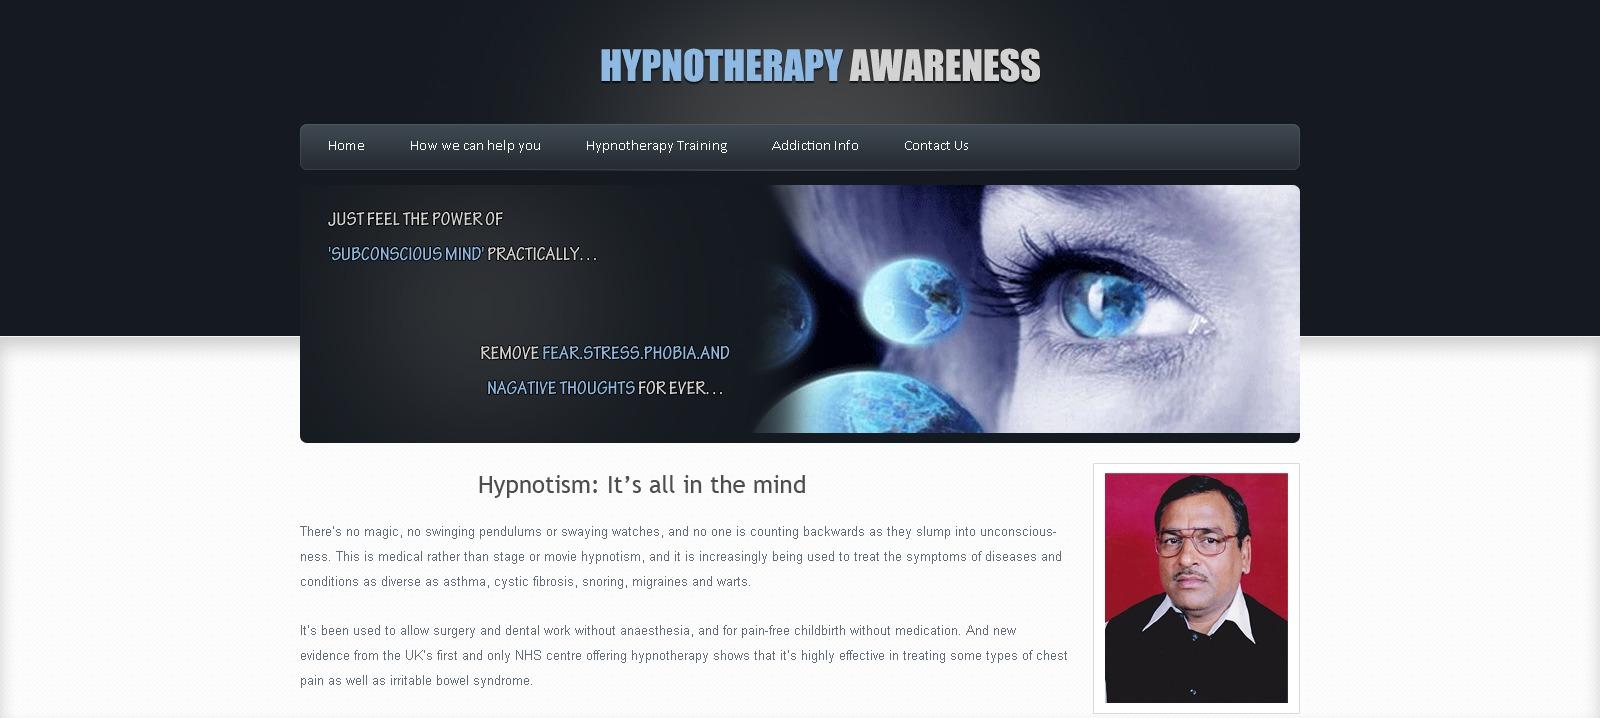 hypnotherapy_awareness WordPress theme